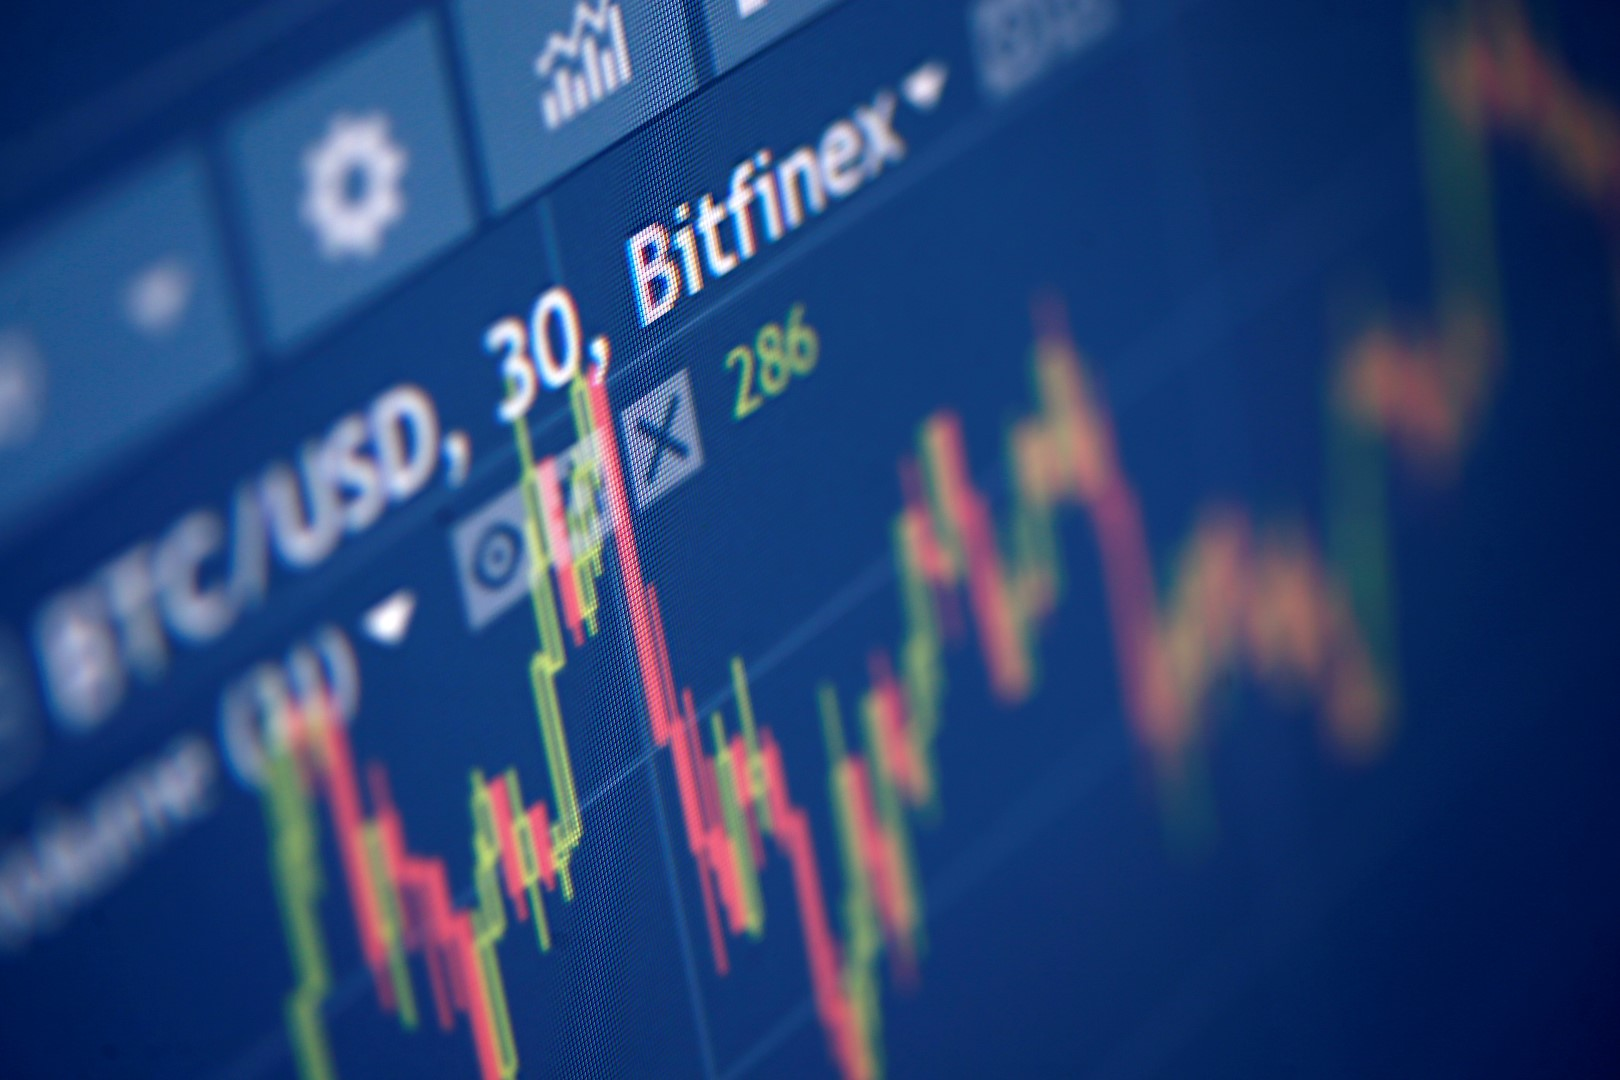 Photo illustration of Bitfinex cryptocurrency exchange website taken September 27, 2017. Picture taken September 27, 2017. REUTERS/Dado Ruvic/Illustration - RC1A90EFFF60